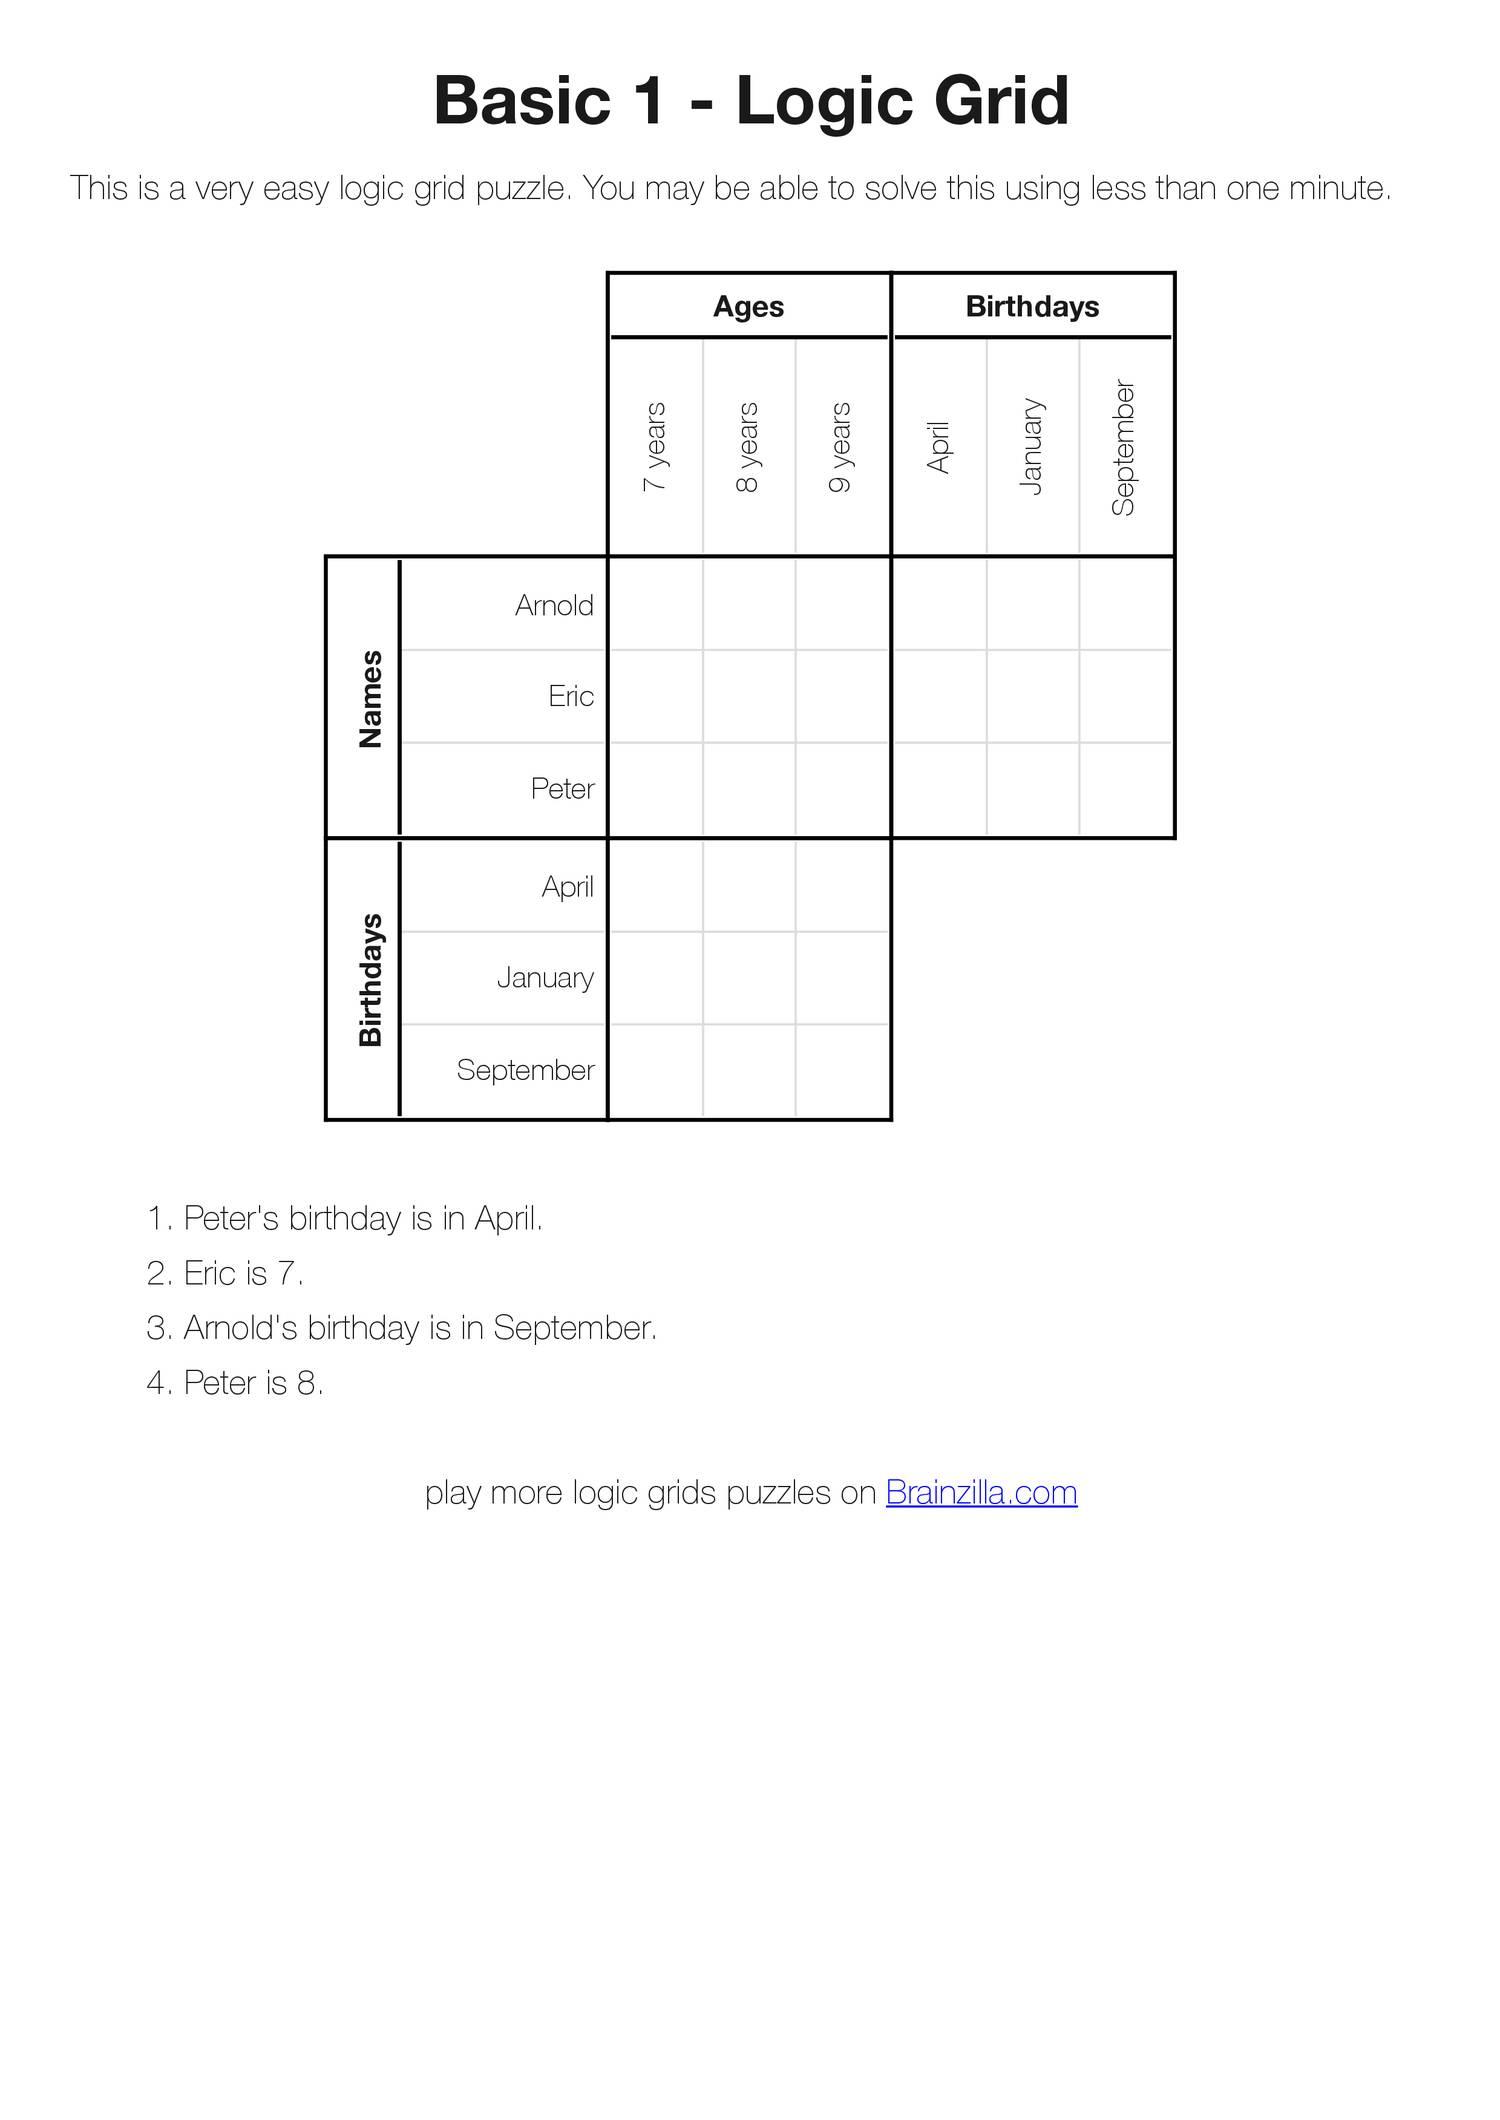 Printable Logic Grid Puzzles (Brainzilla).pdf | Docdroid - Printable Grid Puzzles